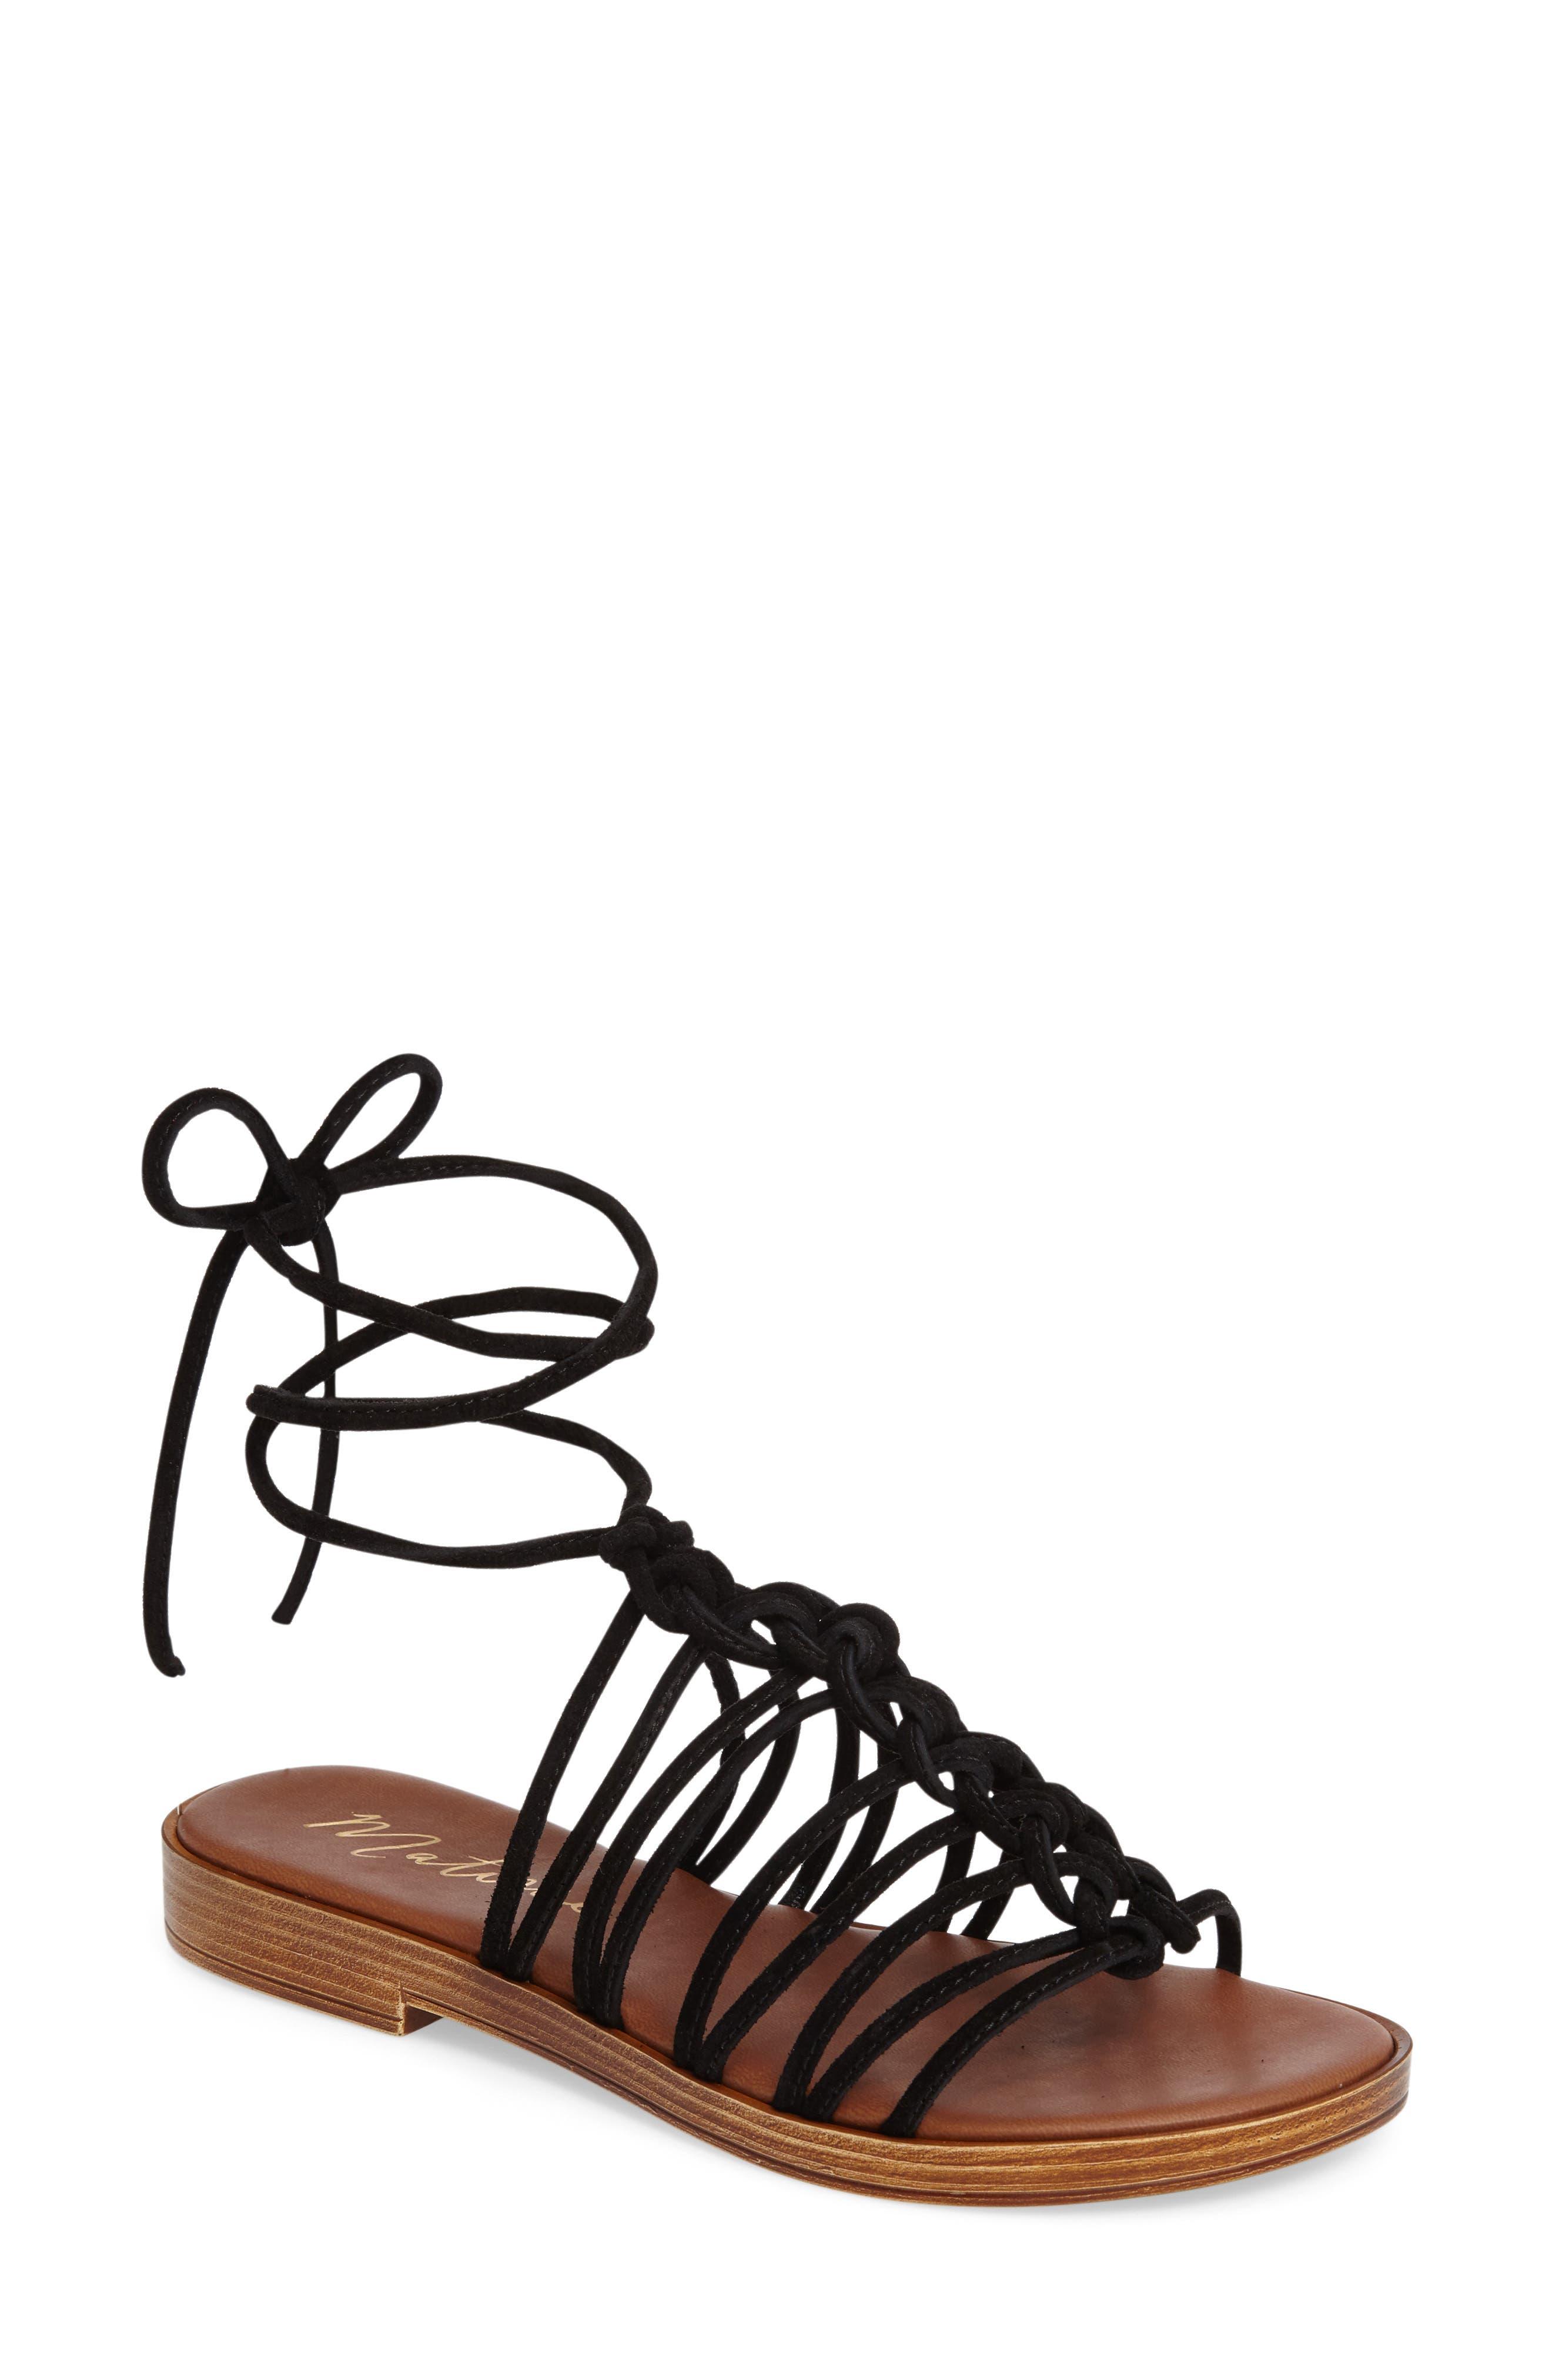 MATISSE Origin Lace-Up Sandal